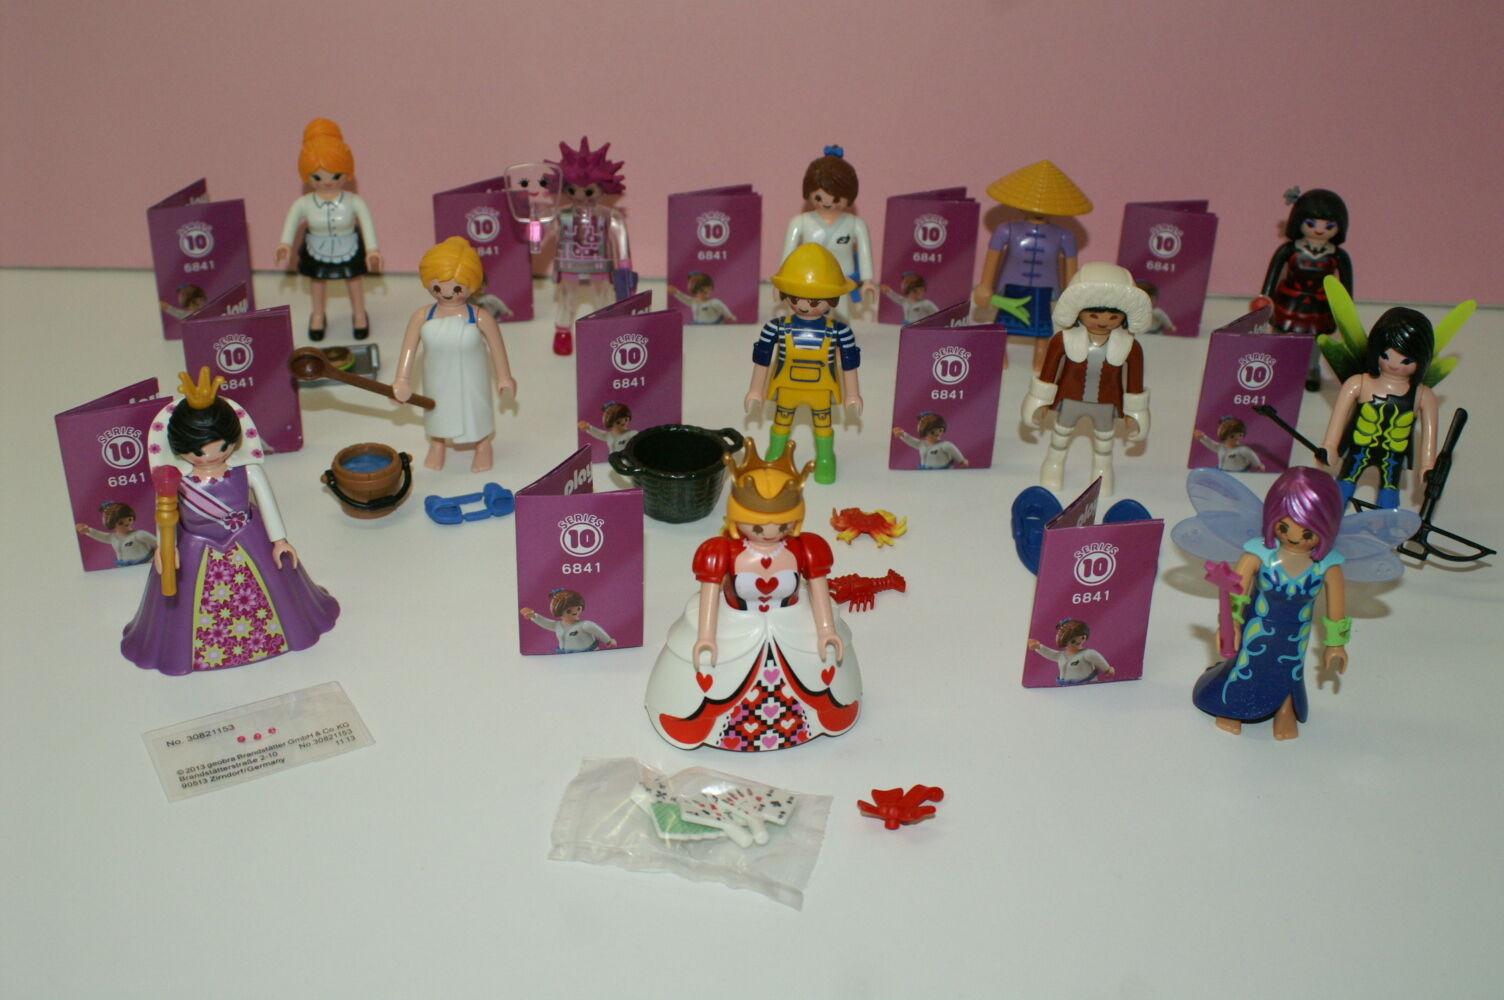 Playmobil Playmobil Playmobil 6841 Figures Girls Serie 10 alle 12 Figuren 3757e8